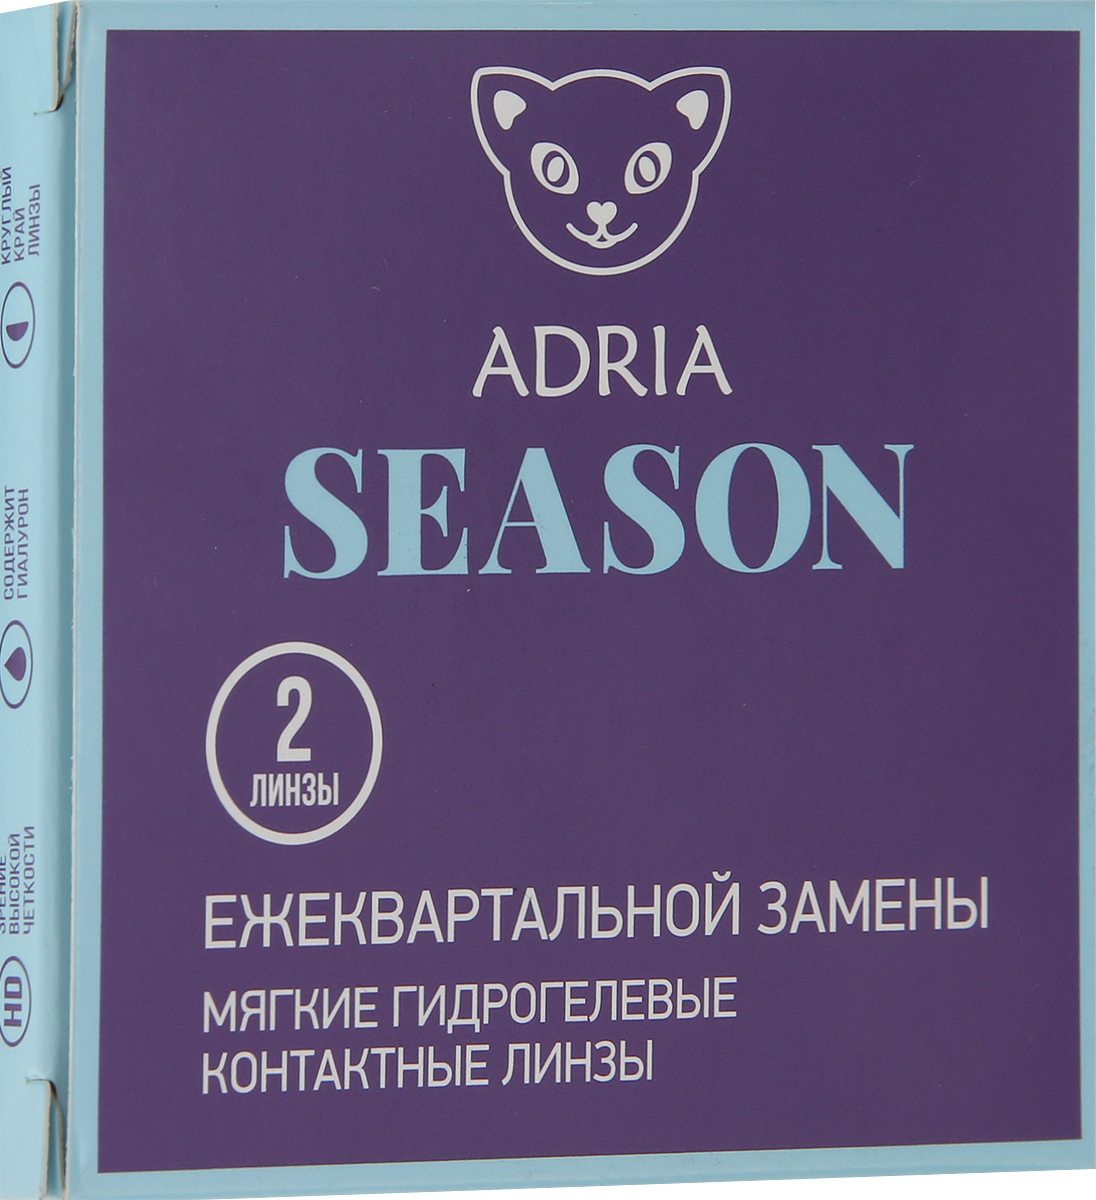 Adria Контактные линзы Morning Q38 / 2 шт / -4.00 / 8.6 / 14